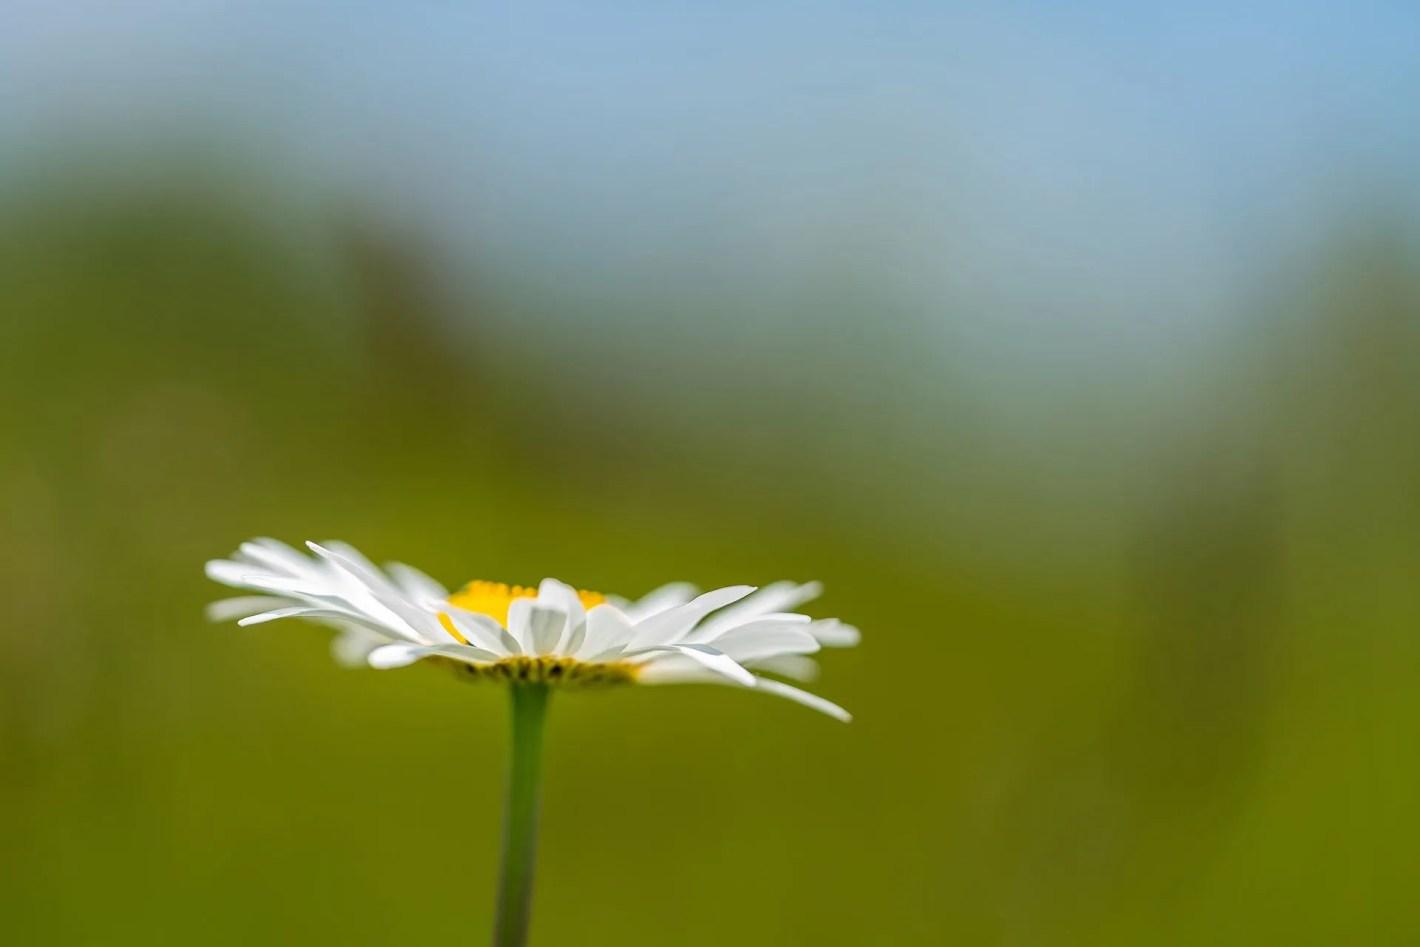 Forgotten Yesterdays - Wildflower Nature Photography